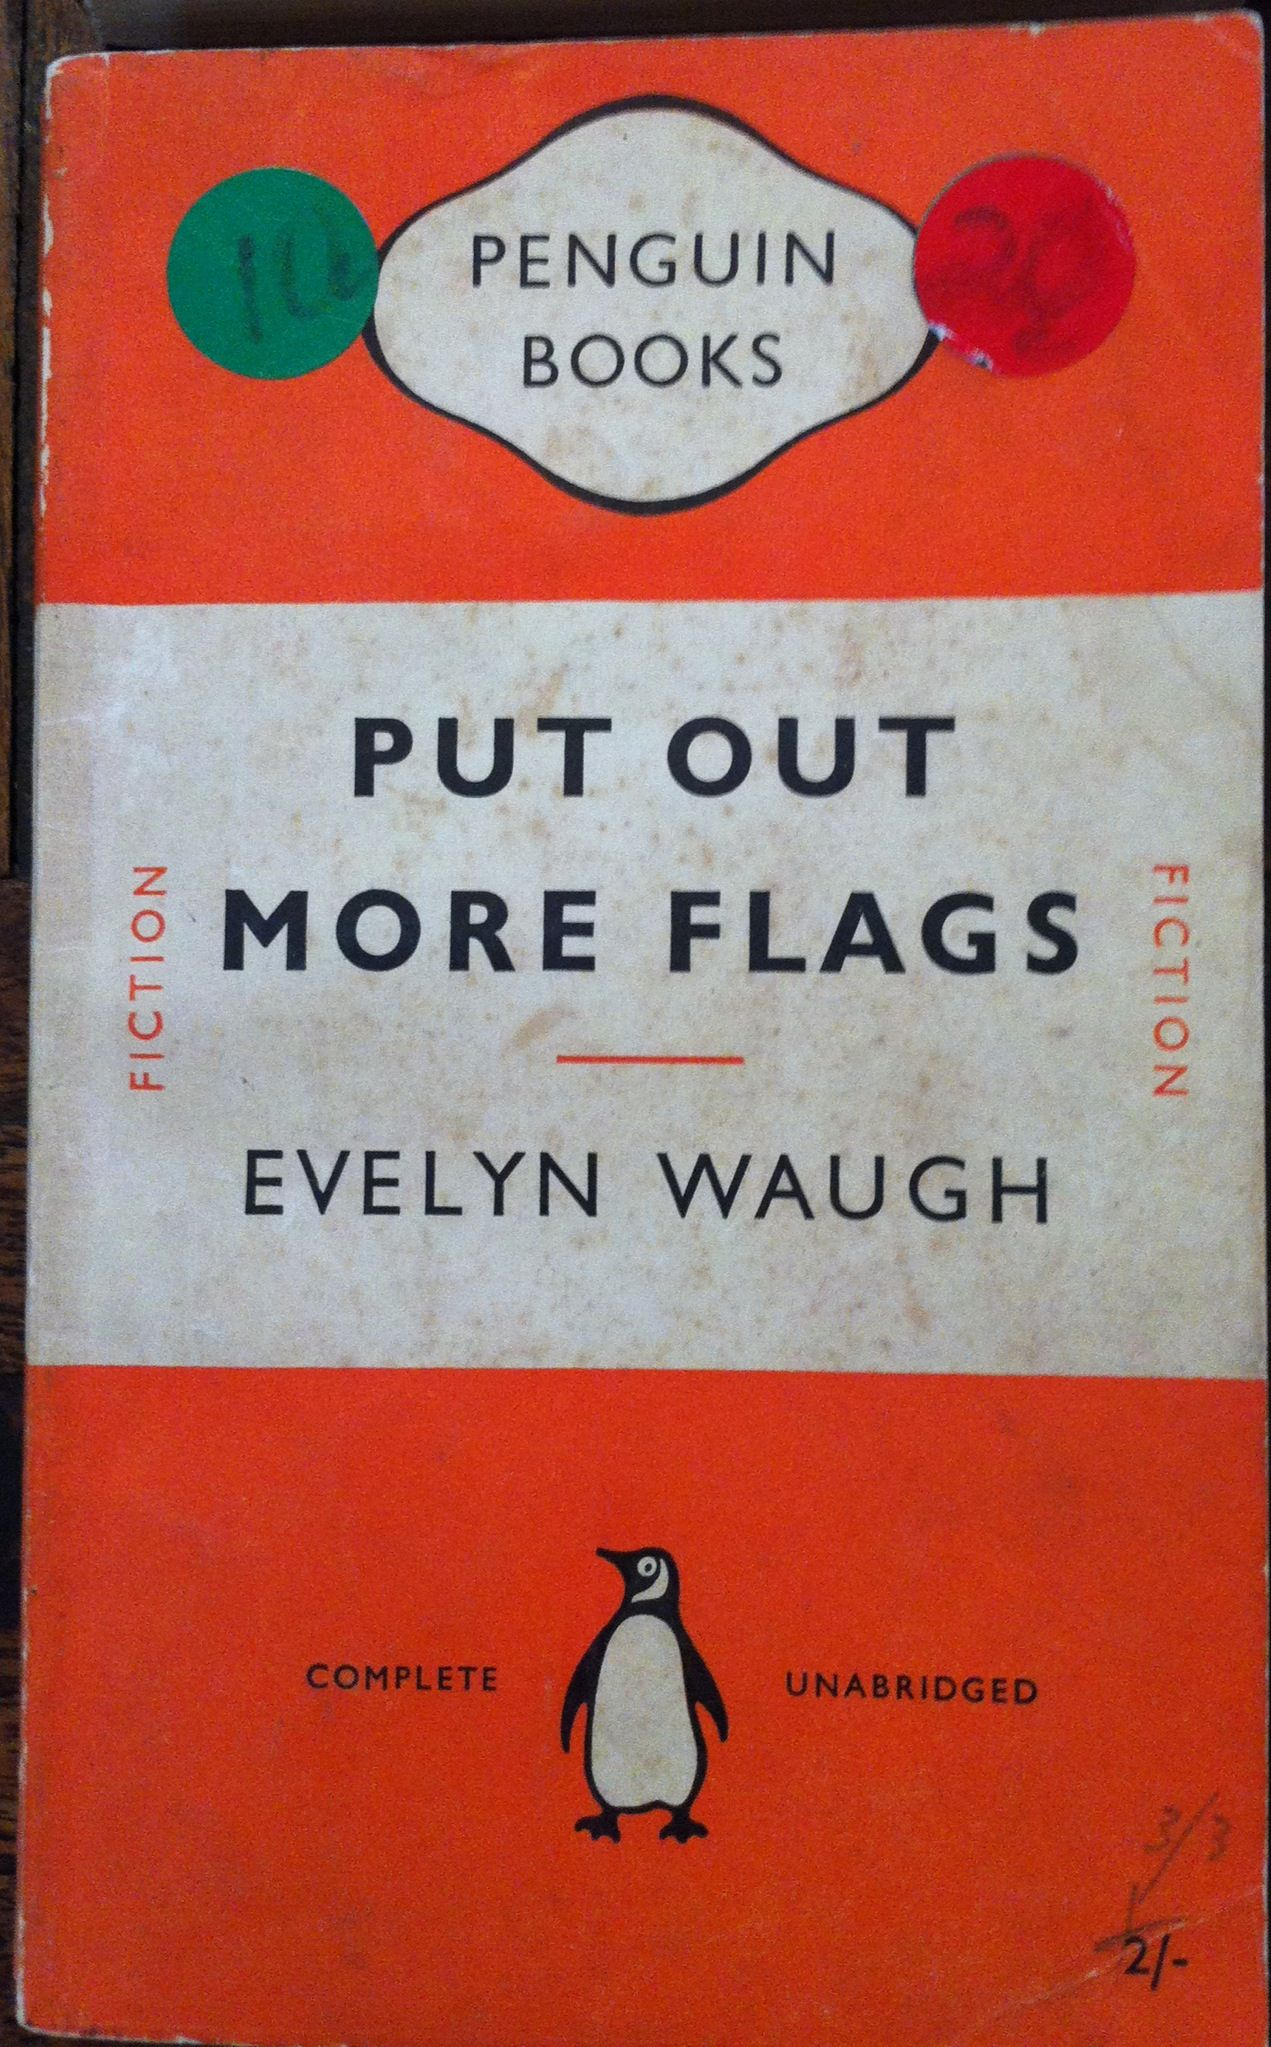 Vintage Penguin Book Covers ~ Evelyn waugh original hipster inspiration pinterest